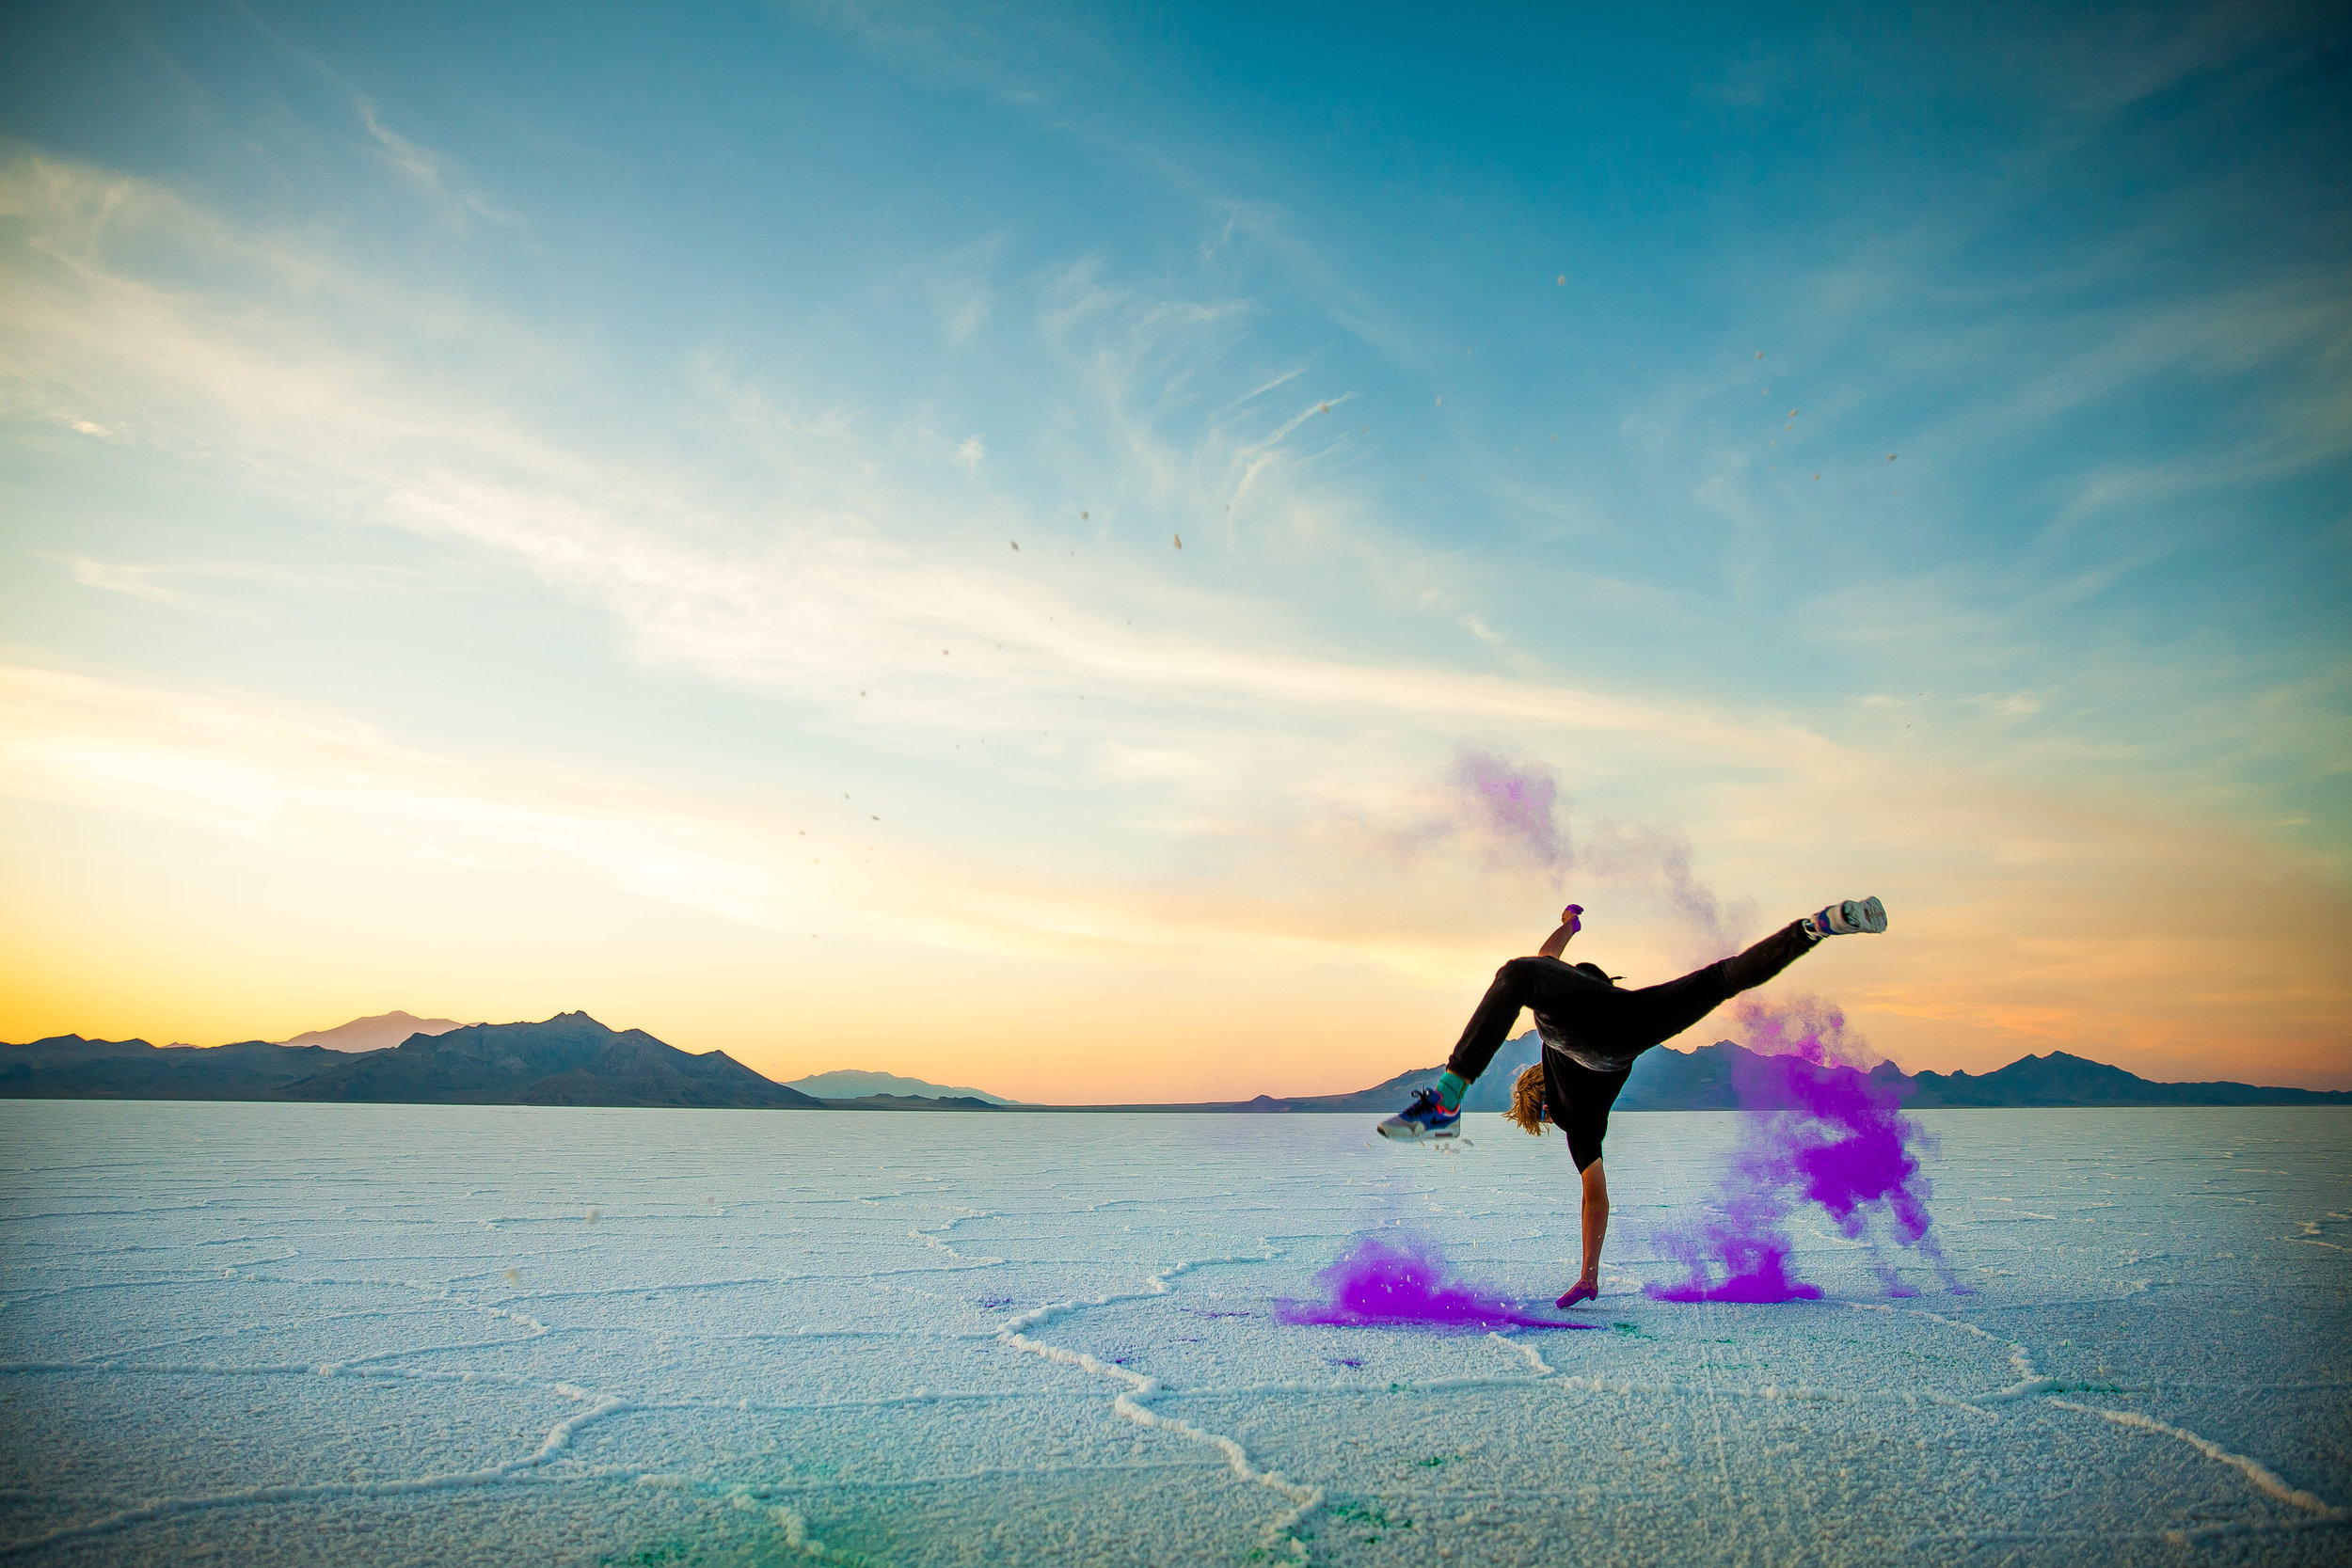 Dancing on The Salt Flats   08 . 27 . 16